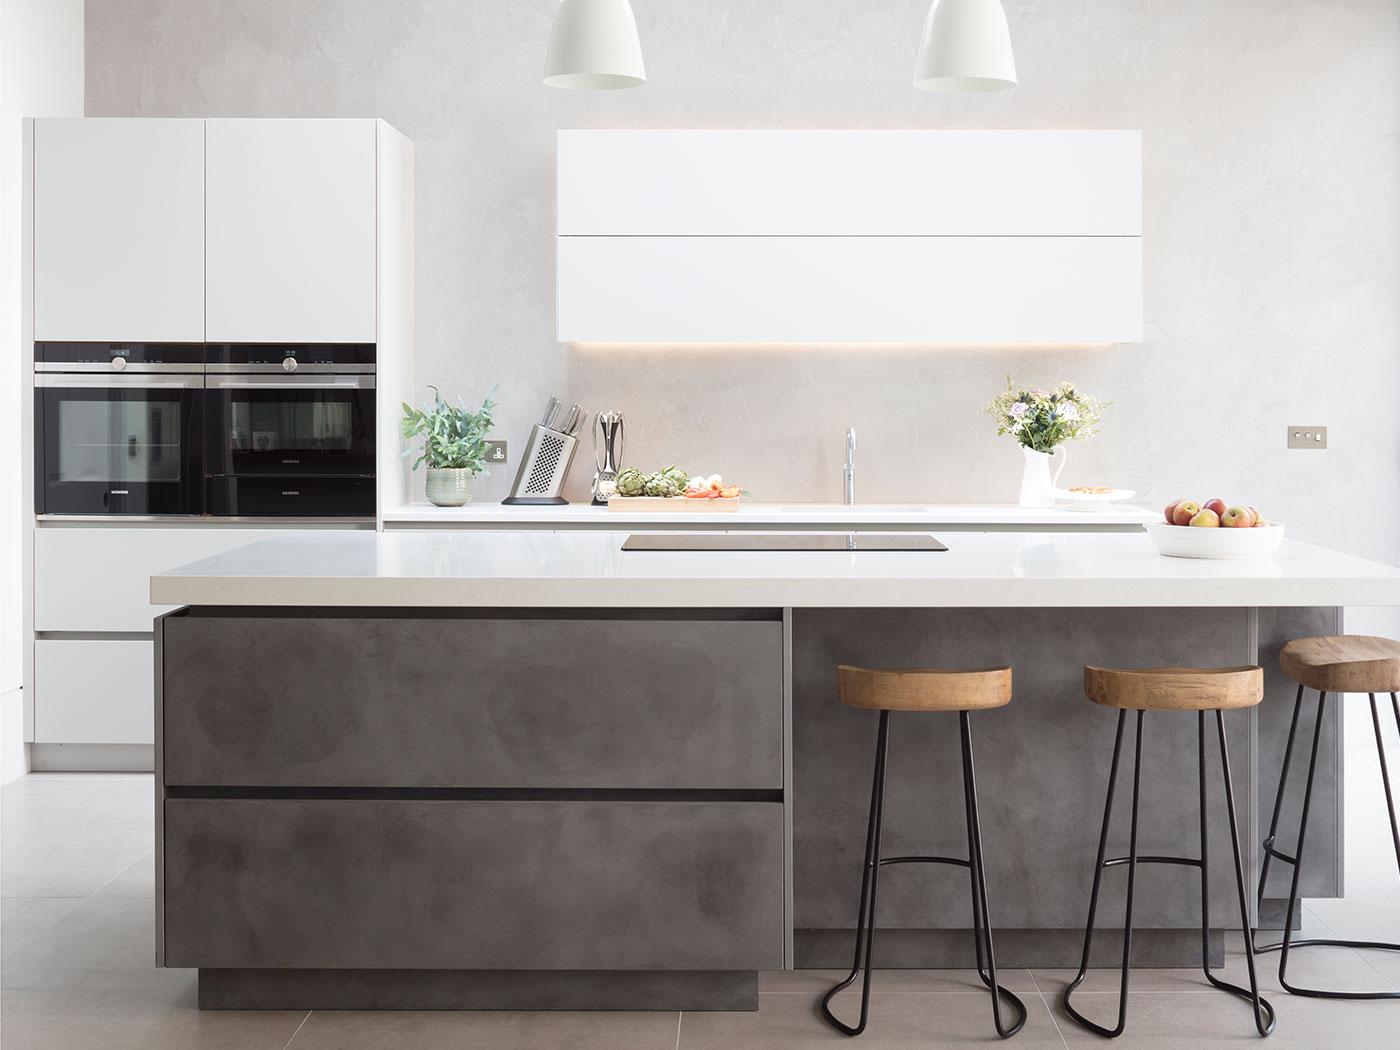 Luxury kitchen design with silver bespoke kitchen island in silver with white work surfaces